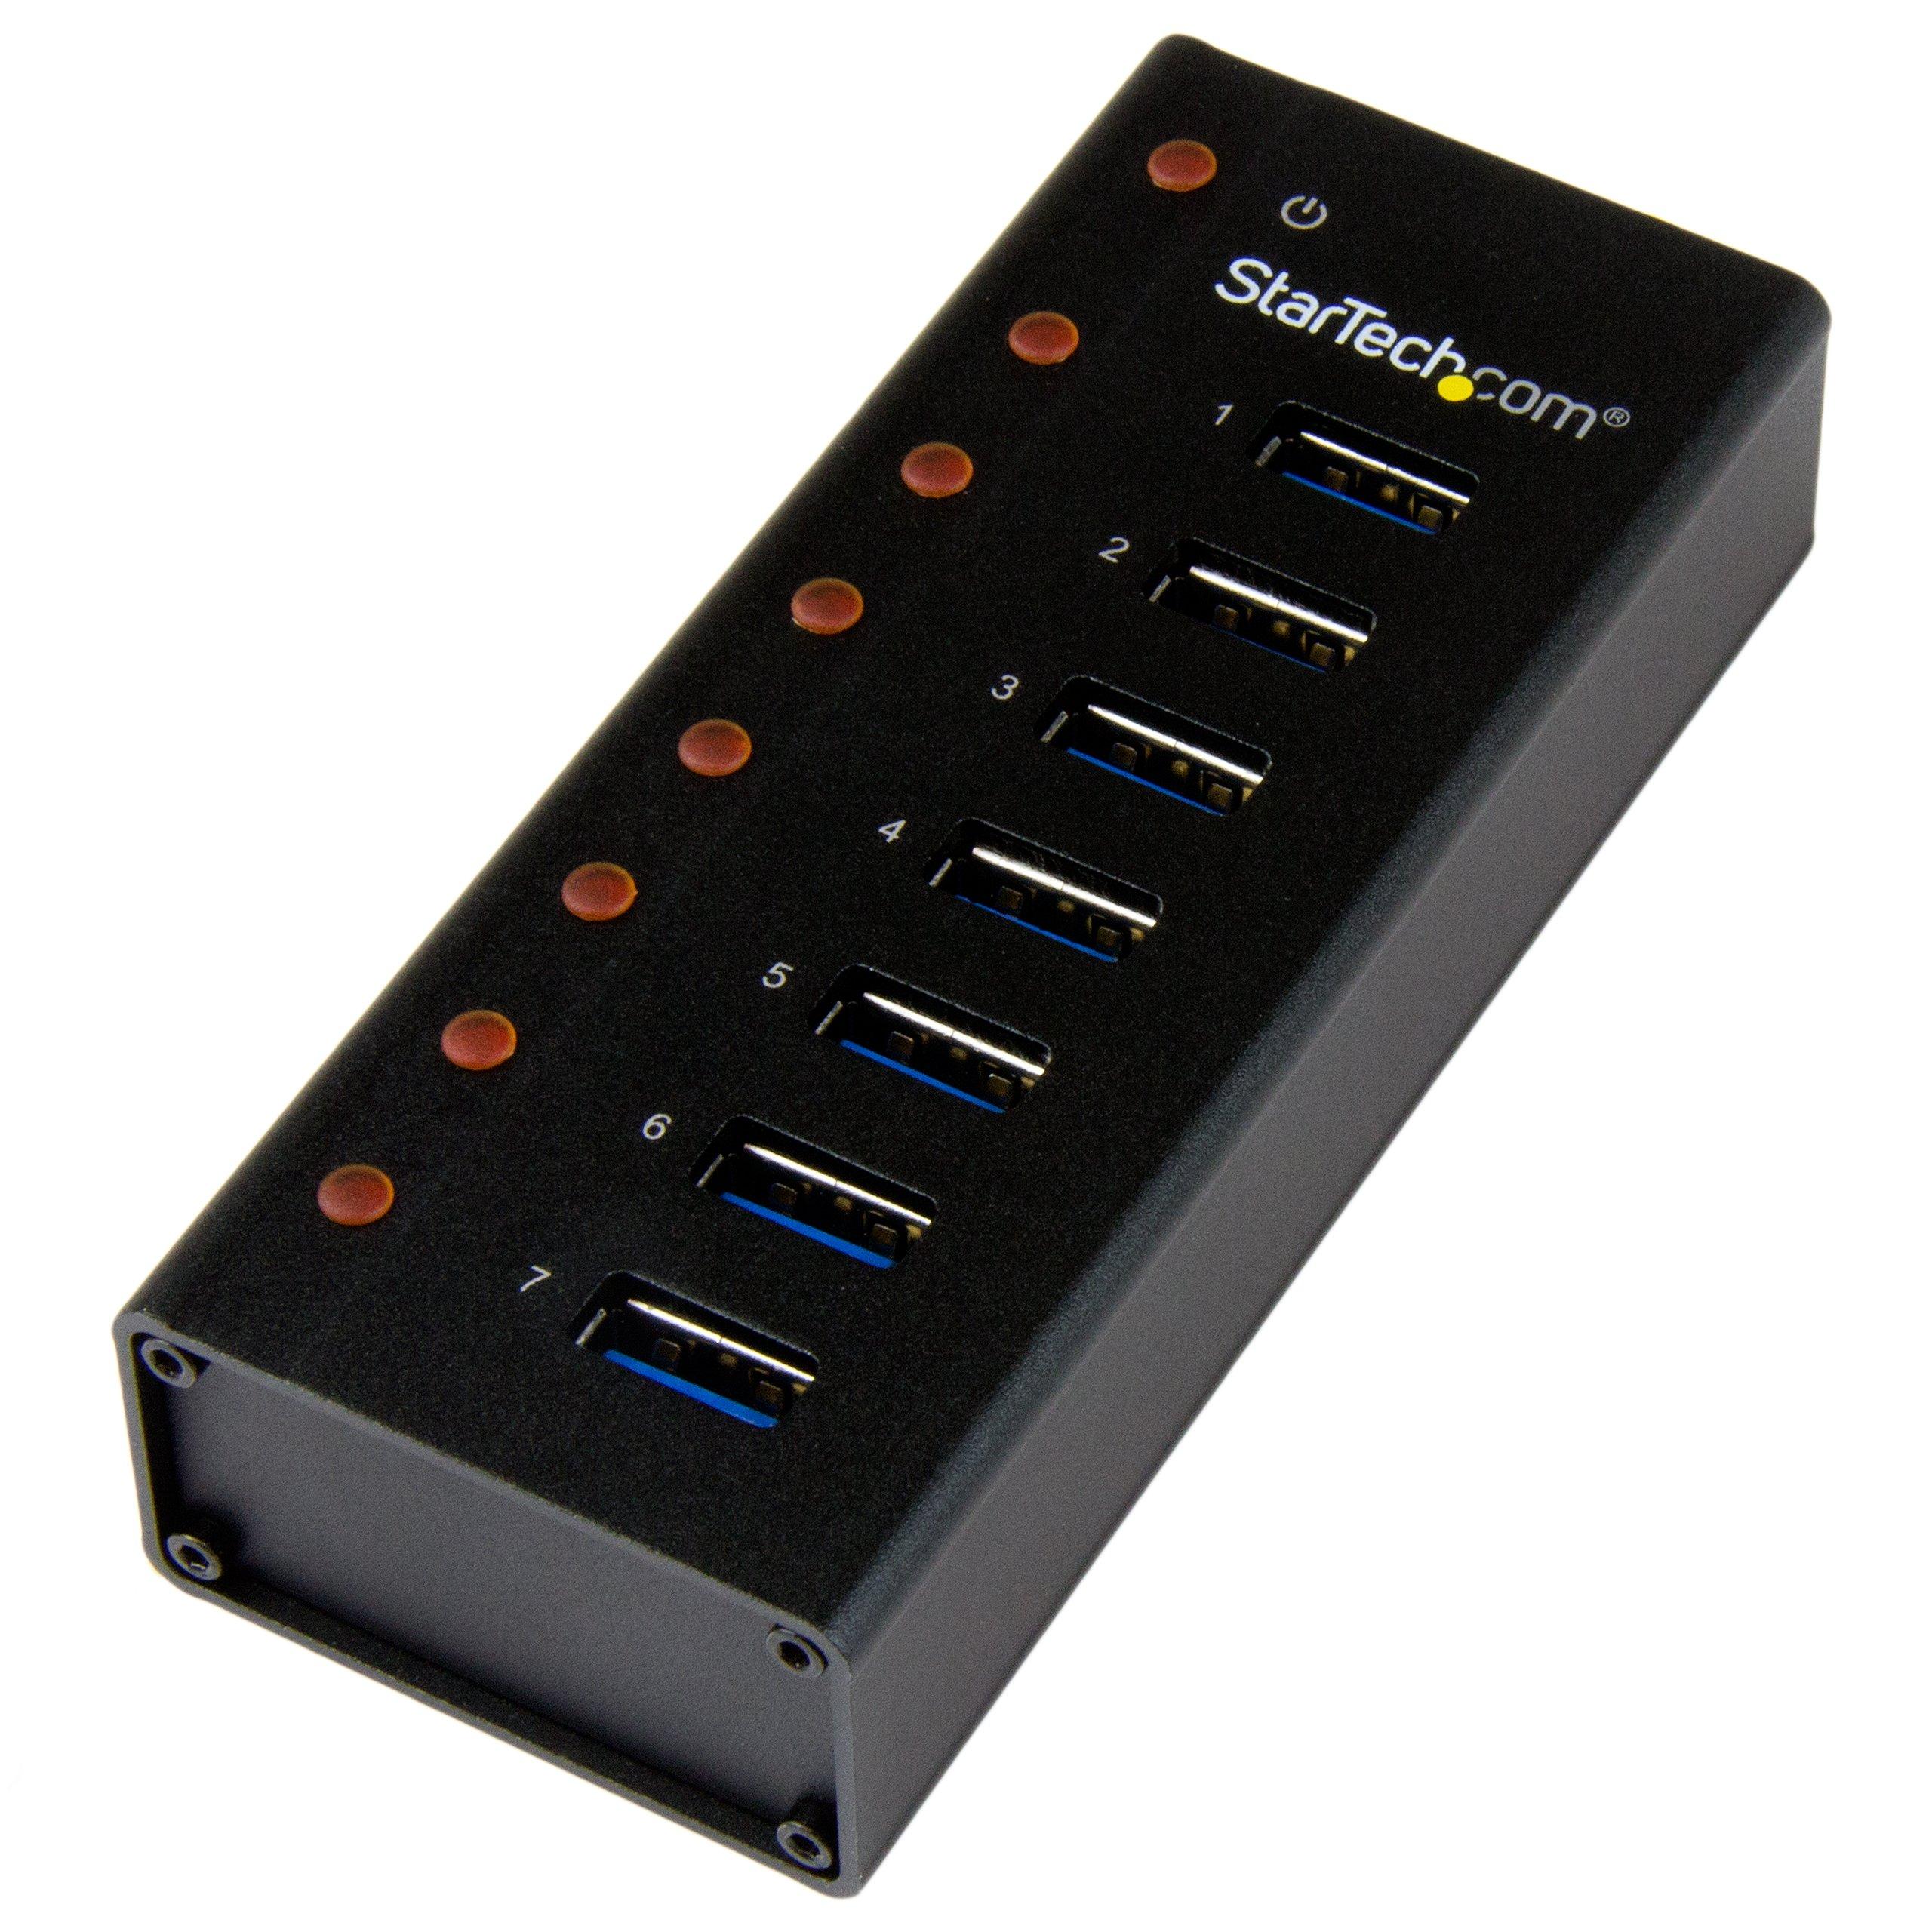 7 Port USB 3.0 Hub - Metal Enclosure - Desktop or Wall Mountable - USB 3 Hub - USB Extender - Powered USB 3.0 Hub - USB Splitter by StarTech